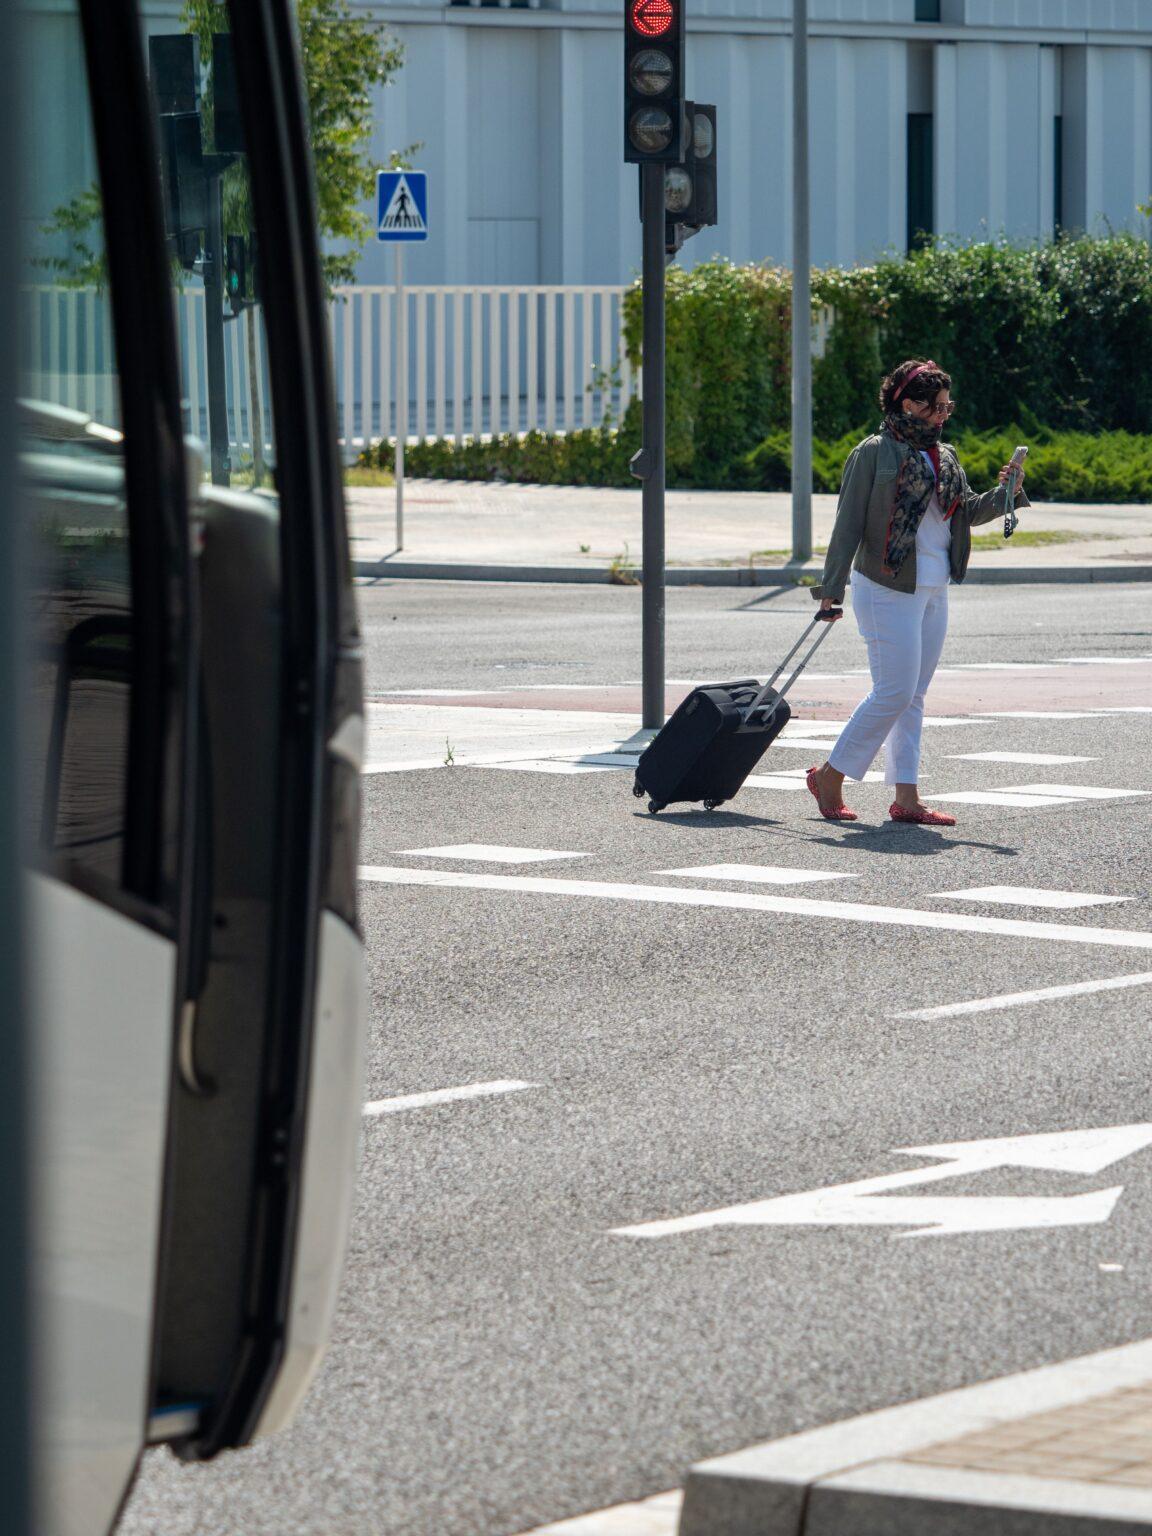 Alquiler de autocar en Barcelona para transfer puerto